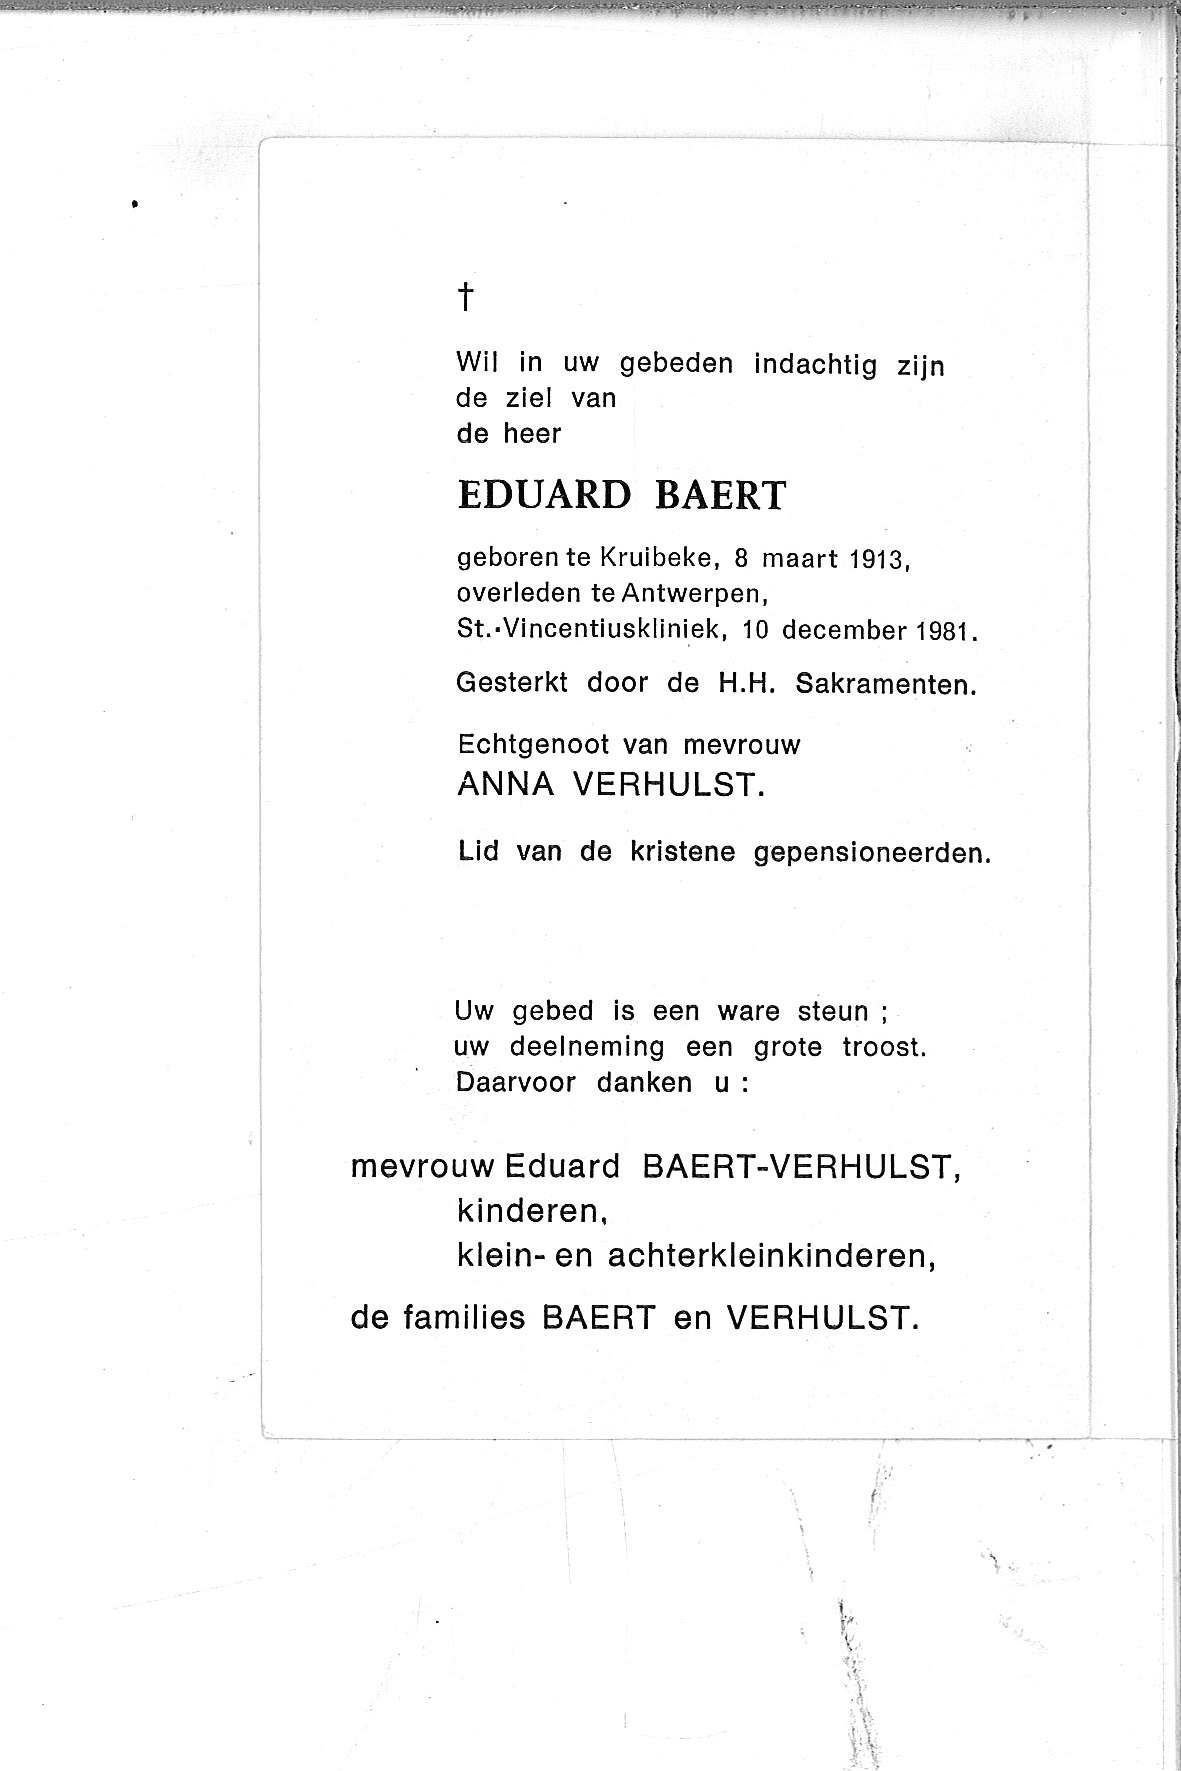 Eduard(1981)20130826134141_00041.jpg